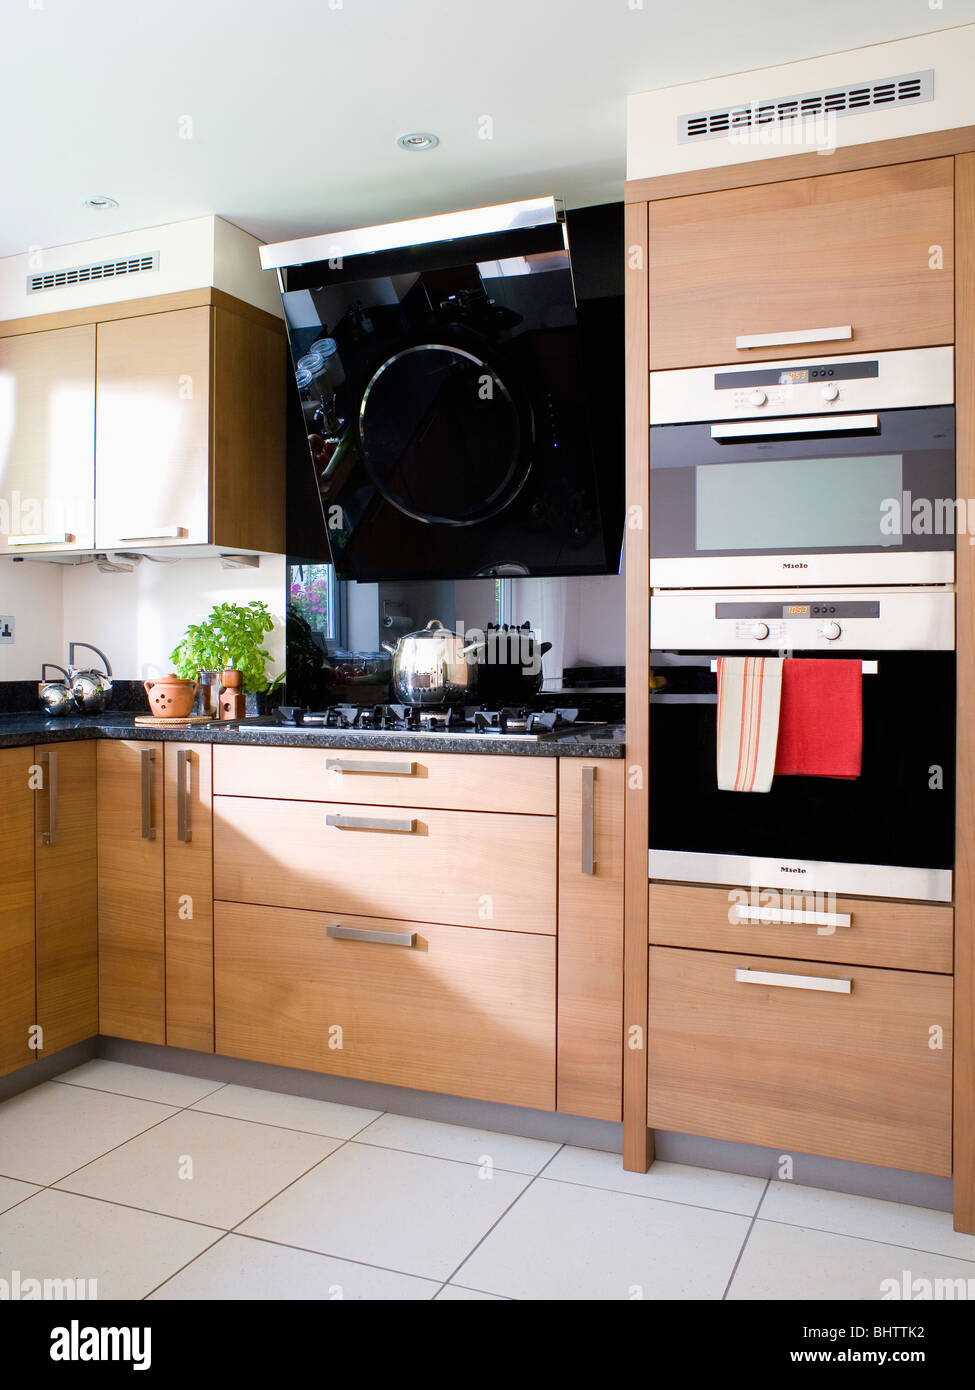 Appliance Neutral Oven Town Stockfotos & Appliance Neutral Oven Town ...